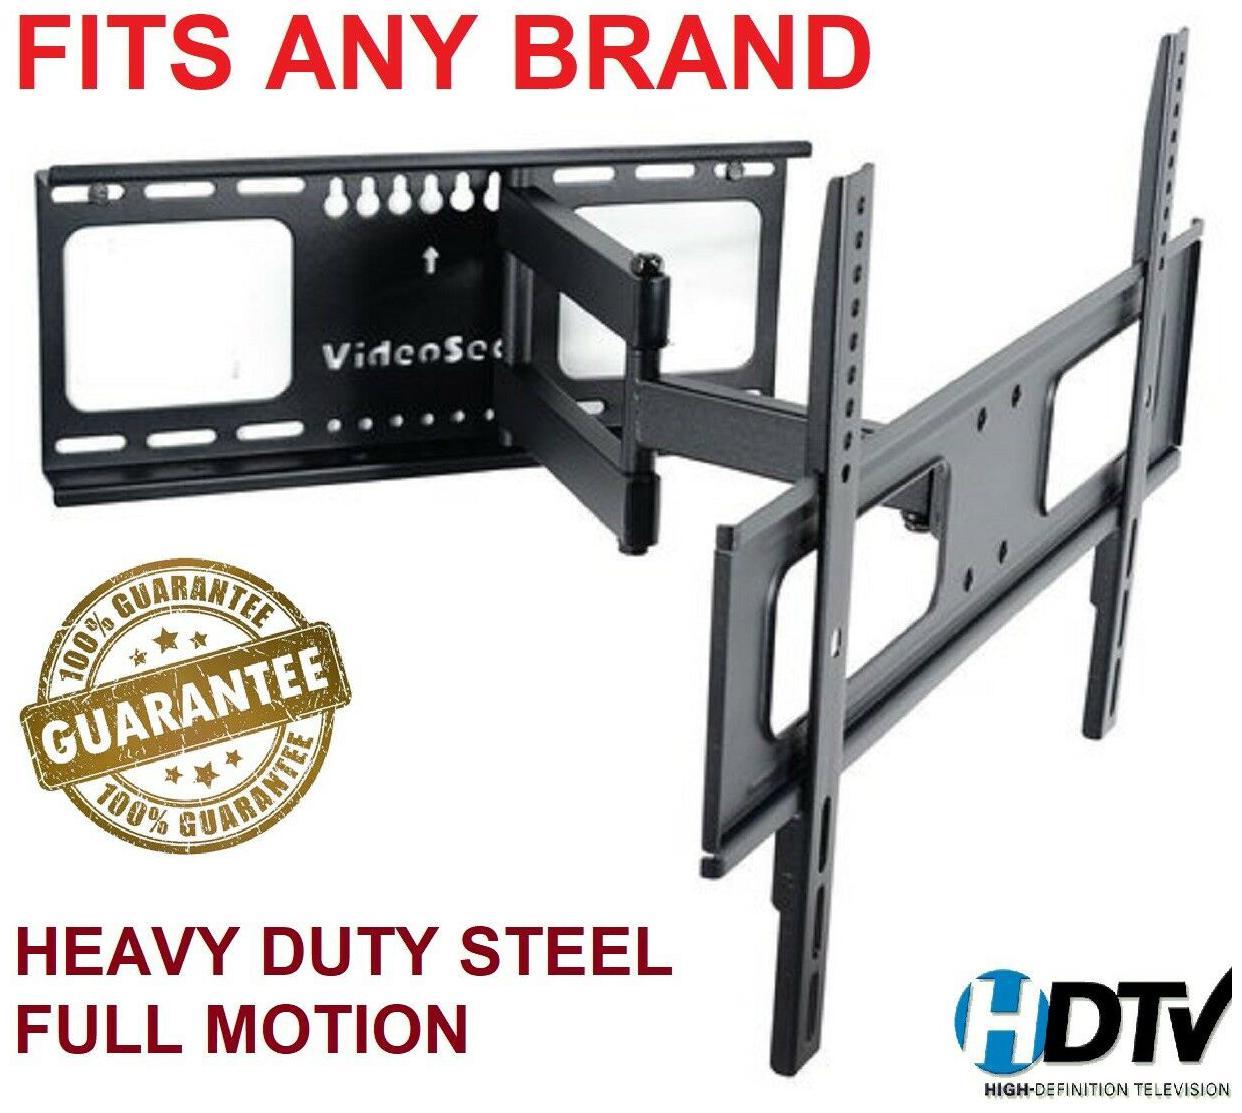 Full Motion TV Wall Mount Swivel Bracket 42 52 55 65 70 Inch LED LCD Flat Screen